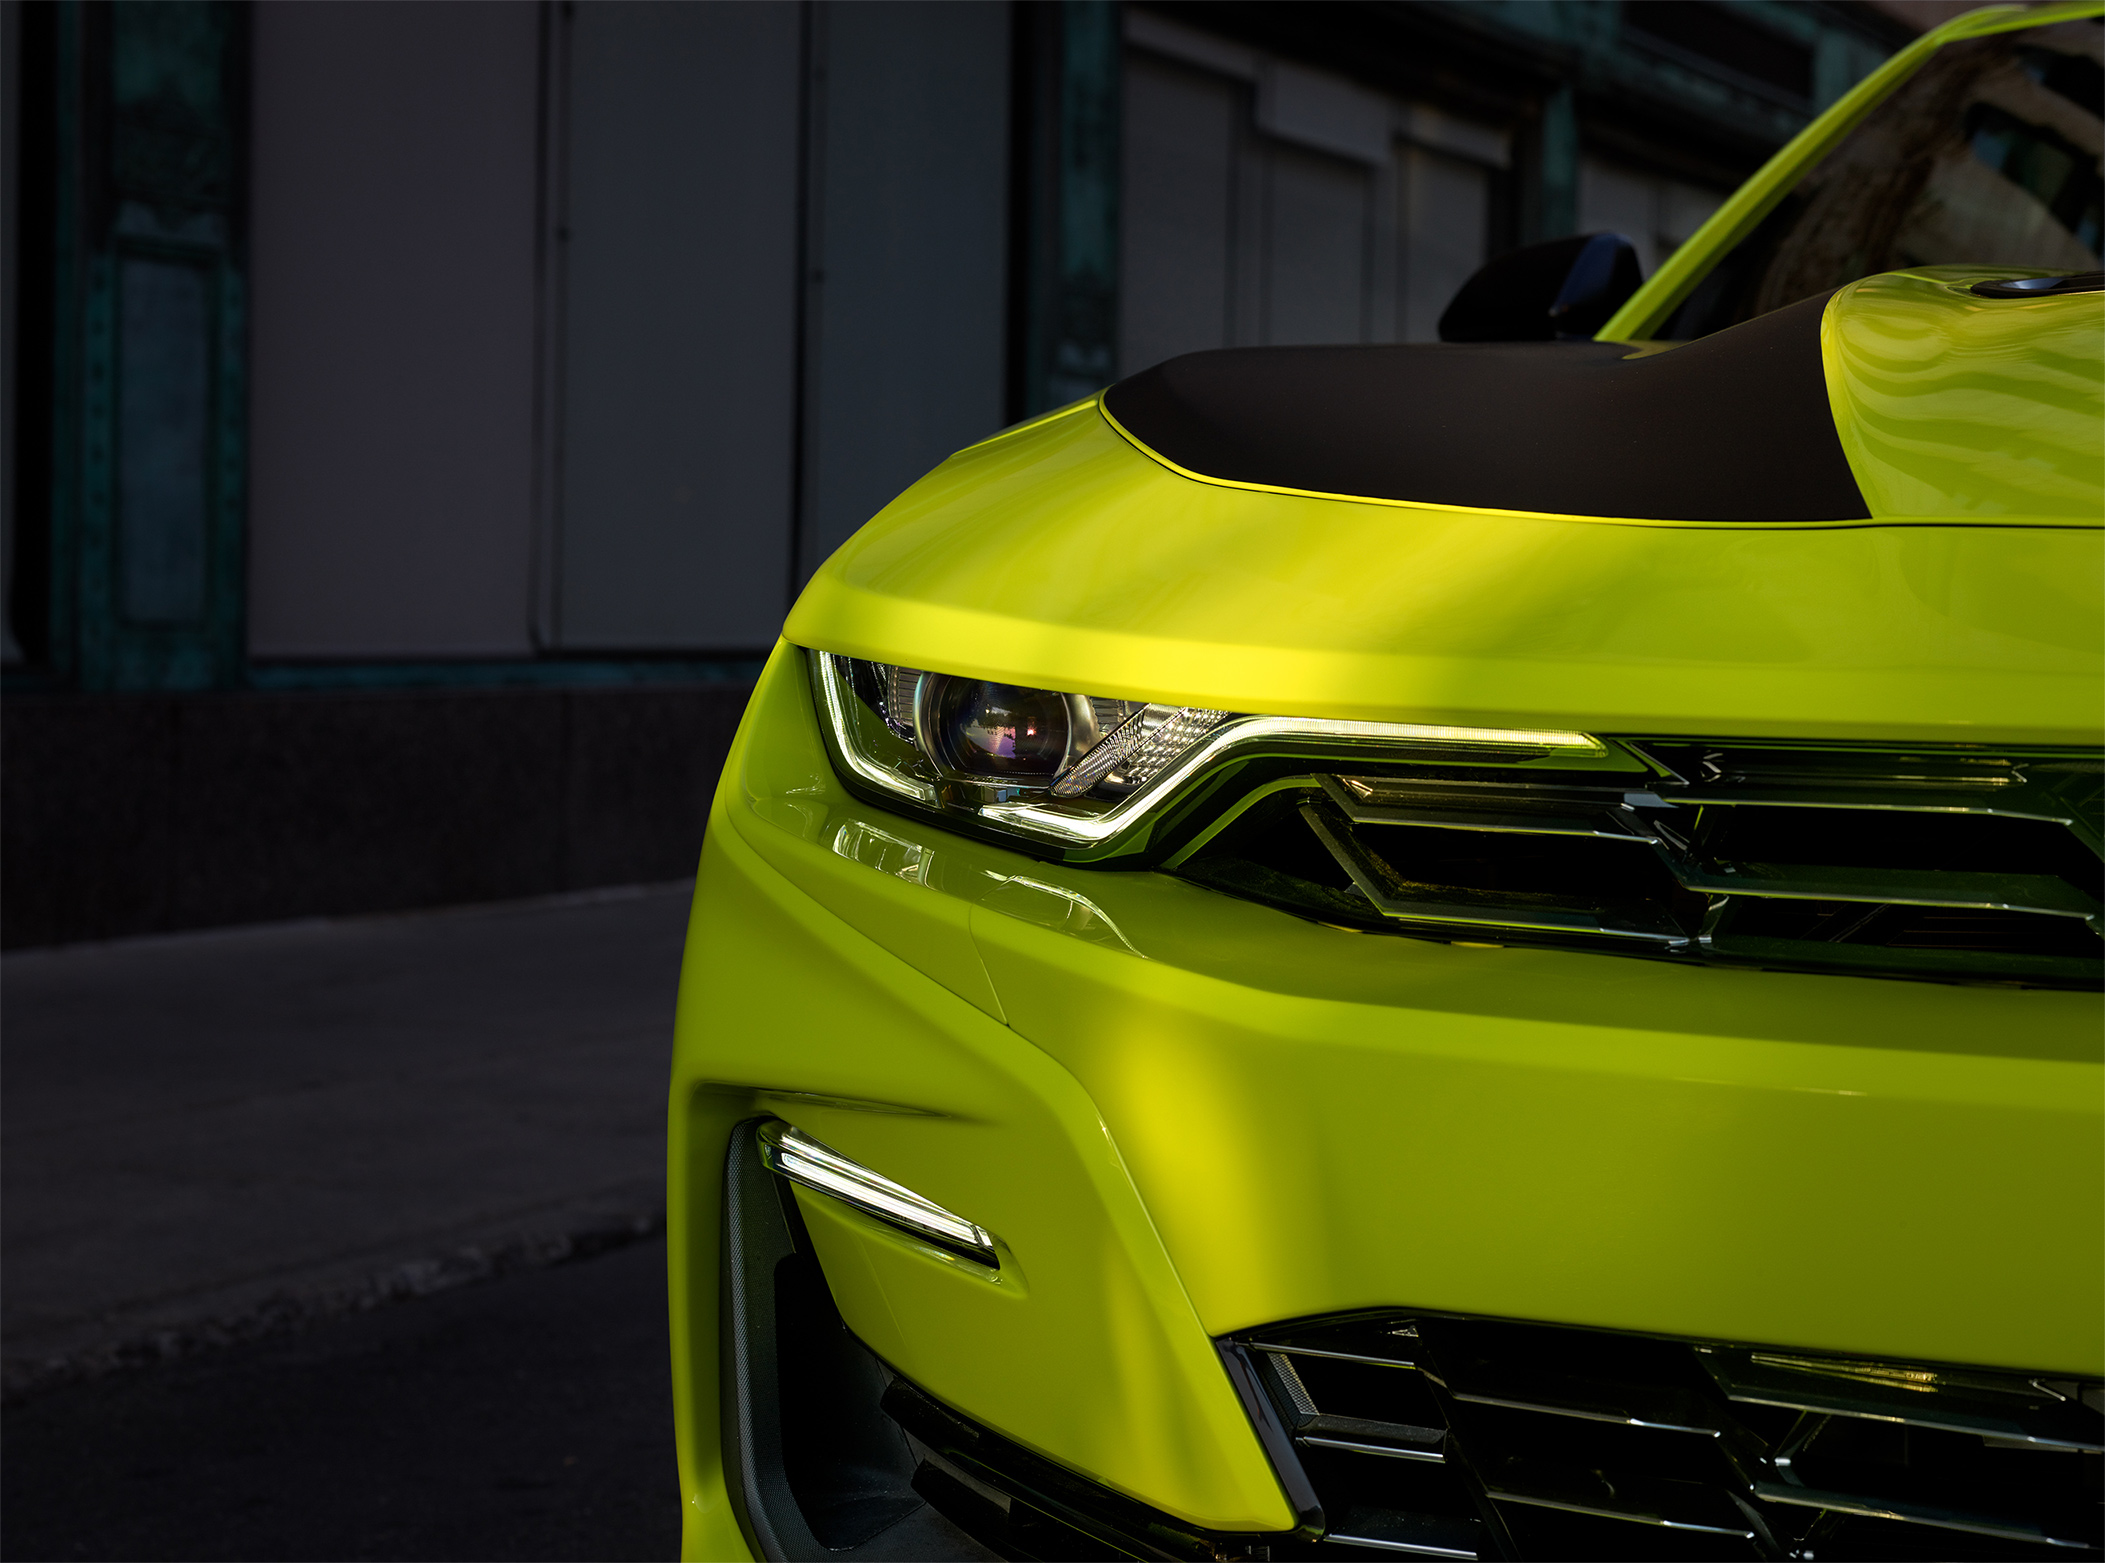 TrackWorthy - 2019 Chevrolet Camaro SS Coupe Shock Yellow (3)